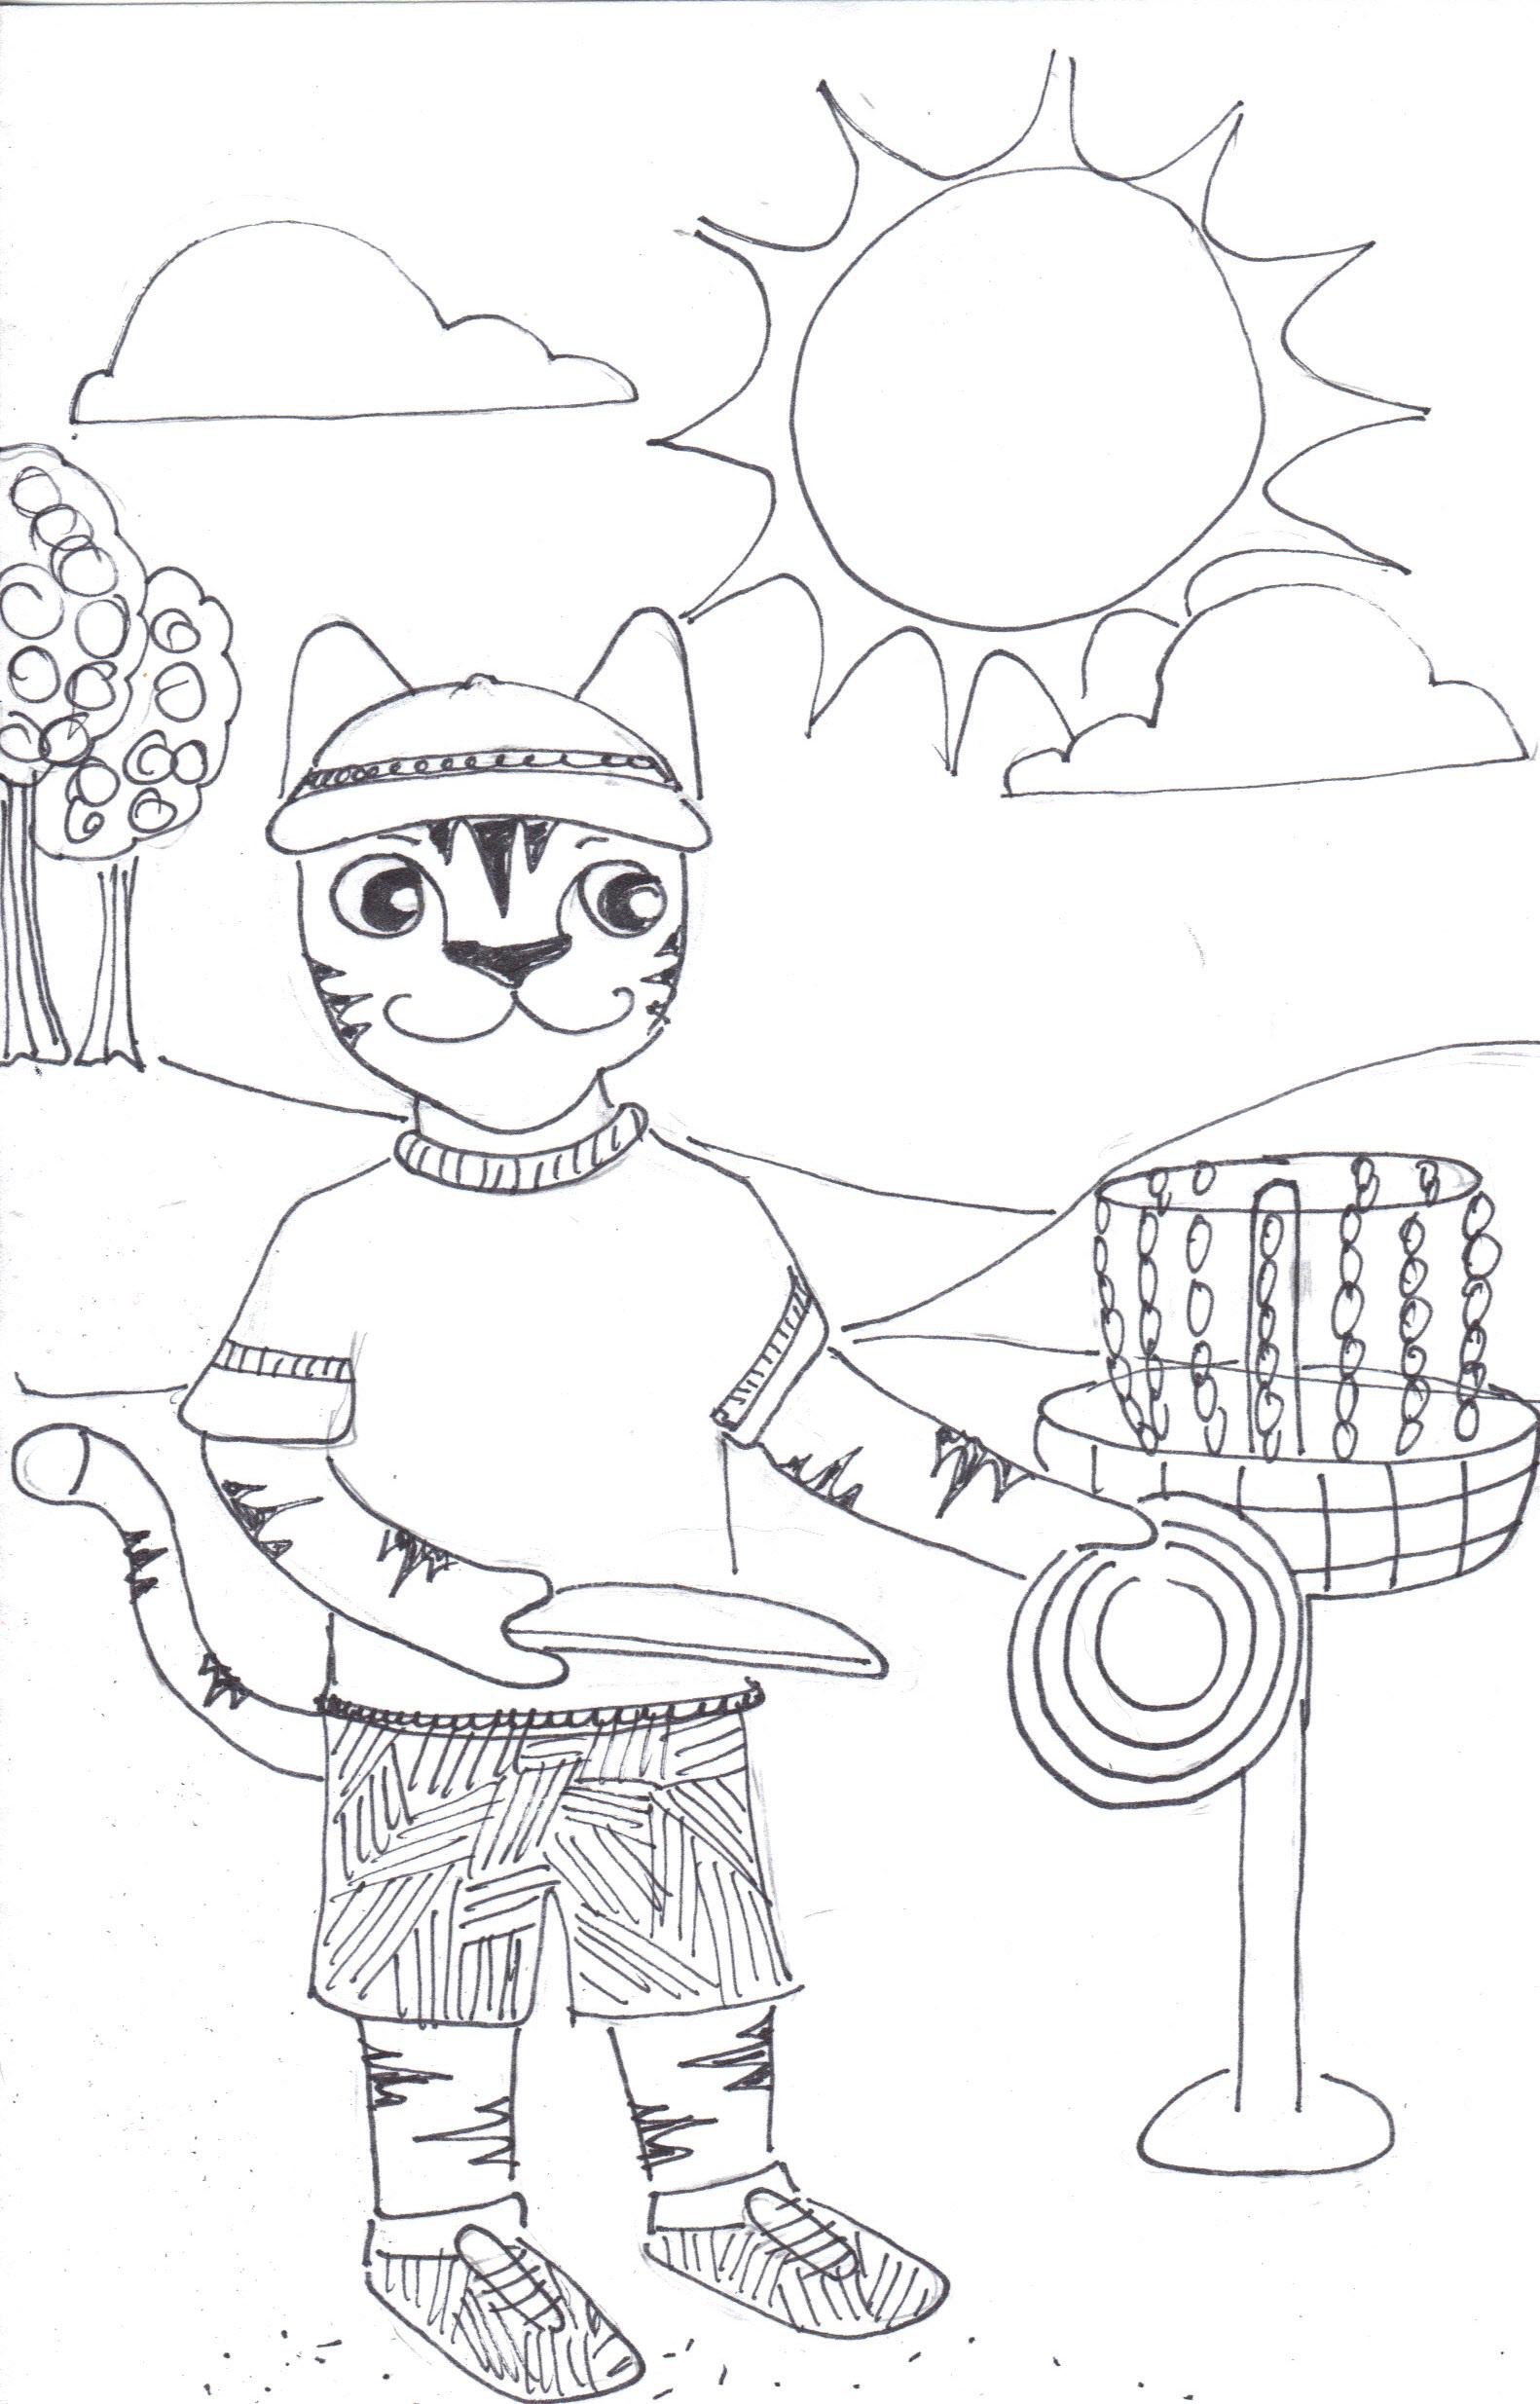 Disc golf cartoon images